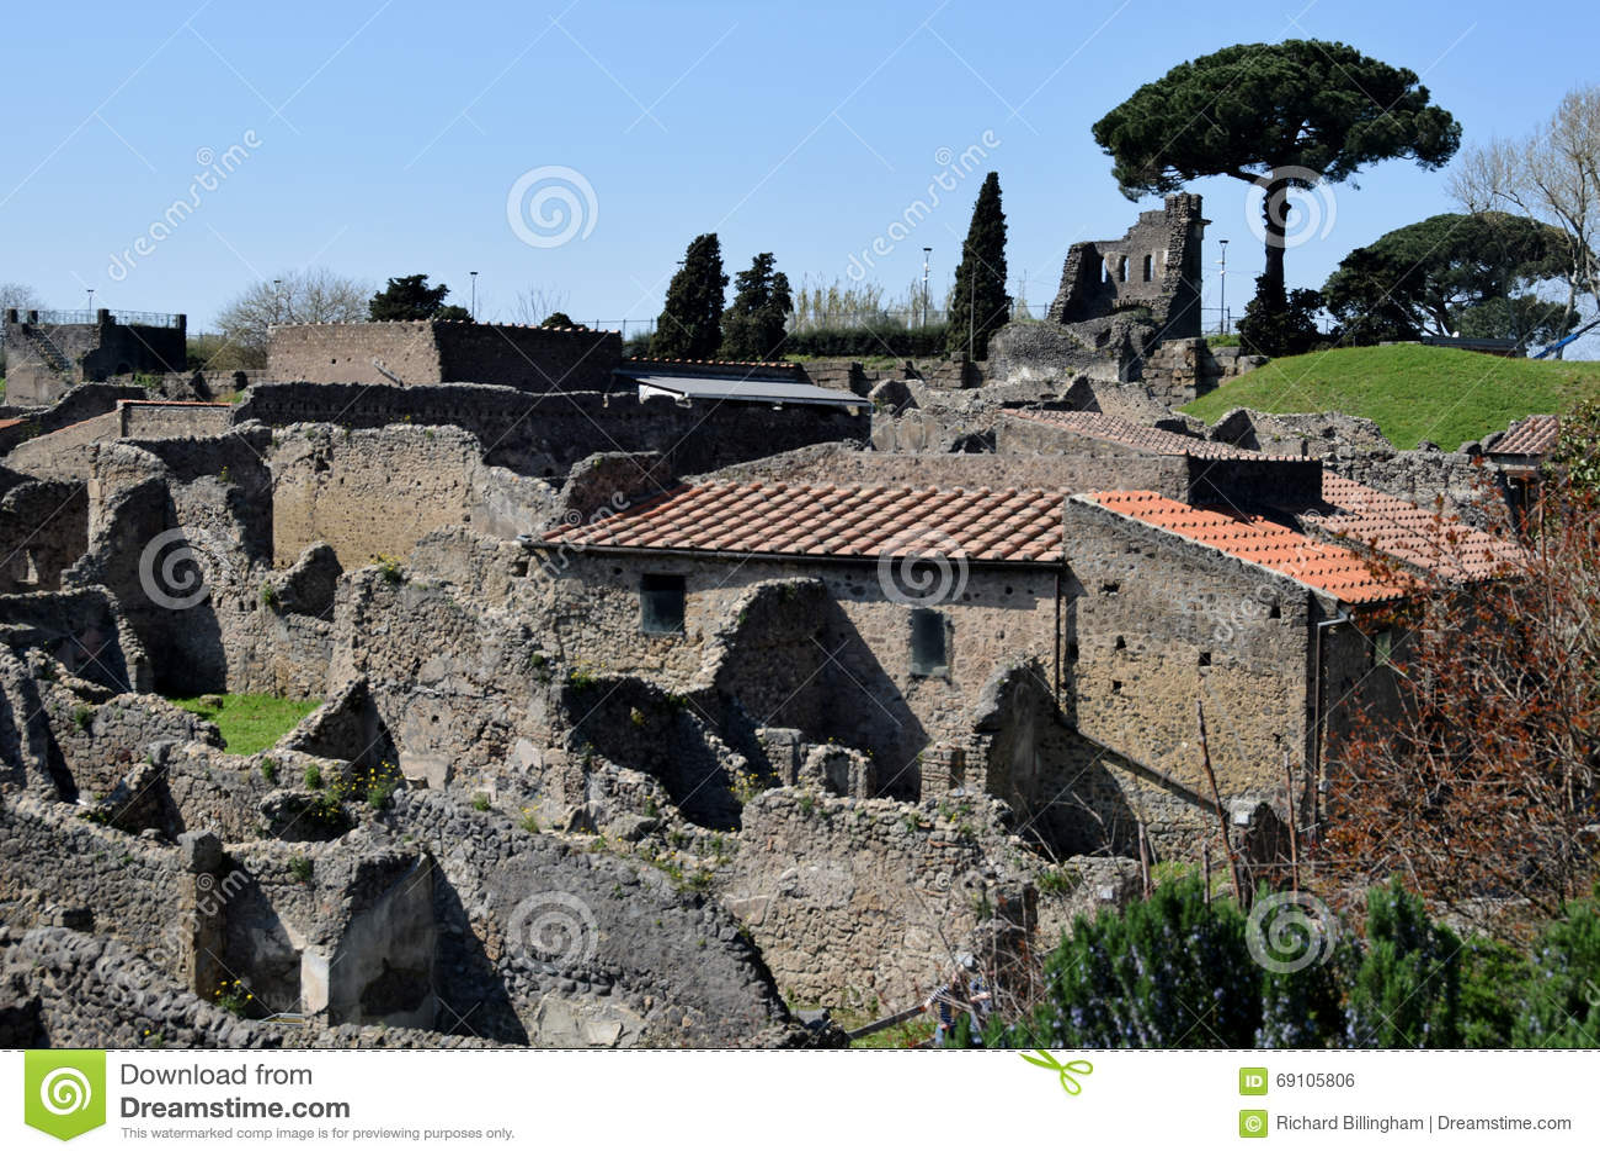 Villas Near Naples